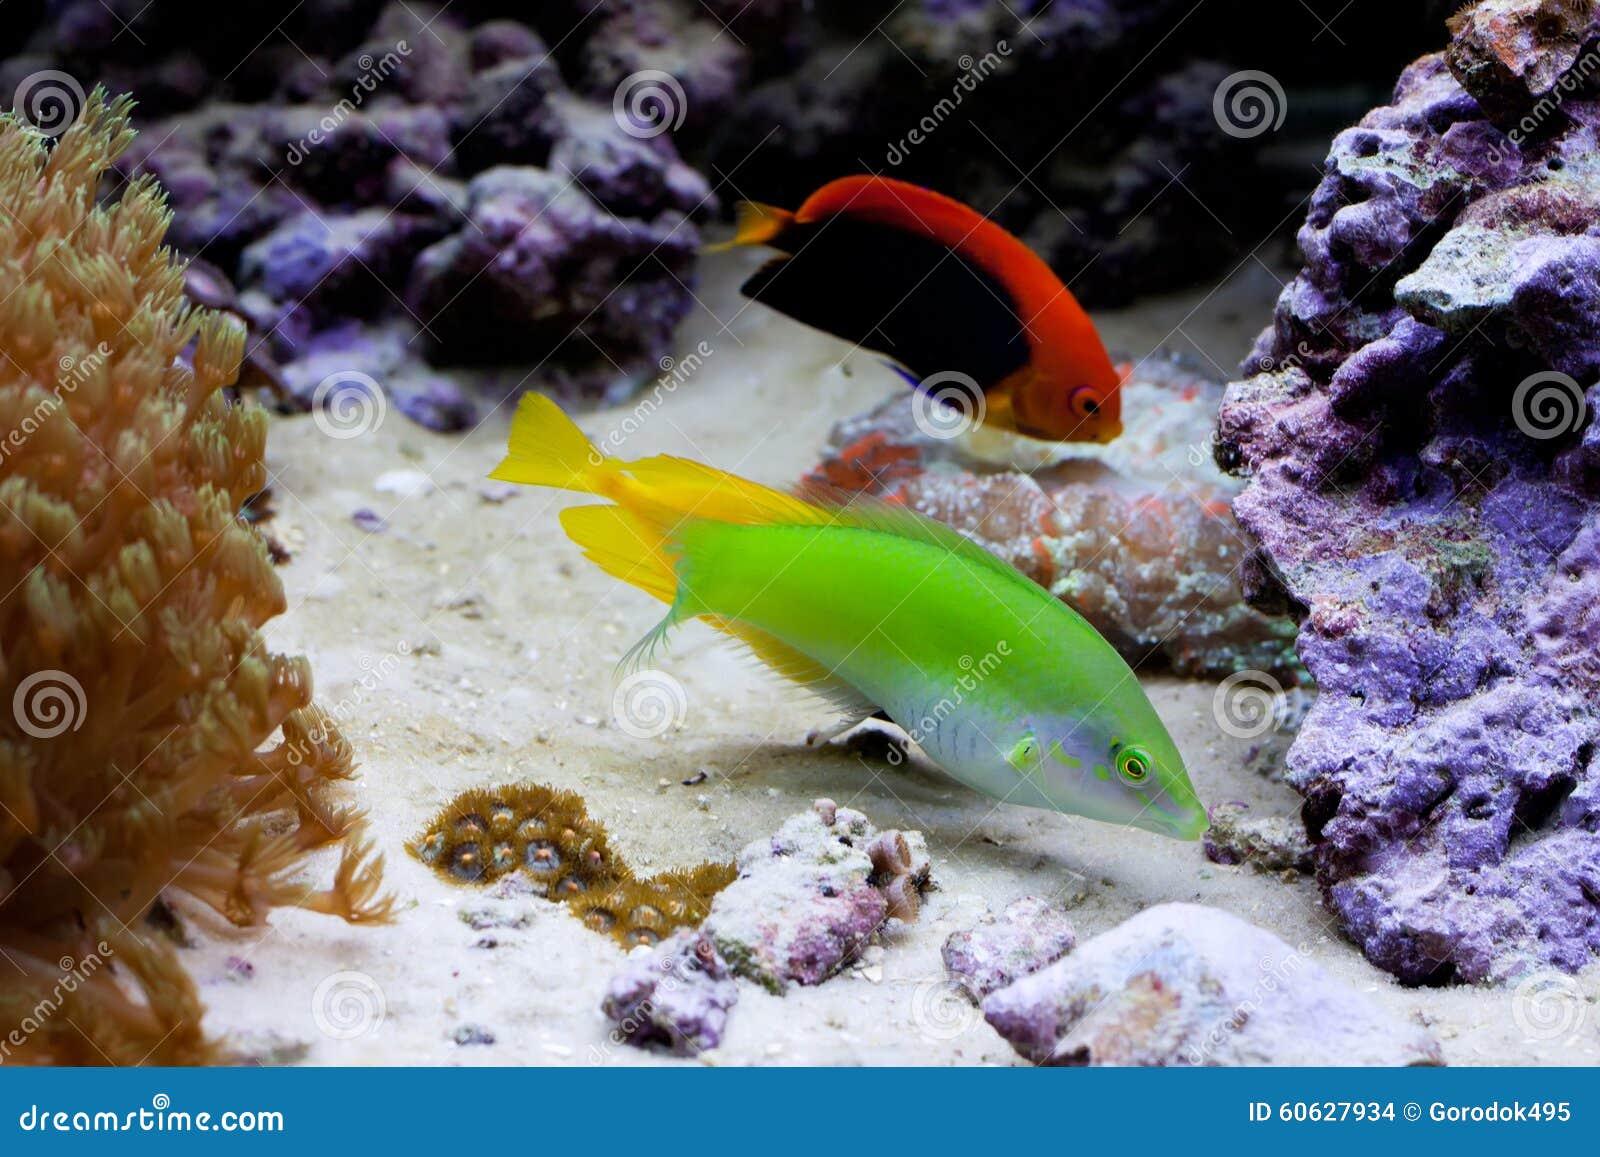 acquario tropicale marino con i pesci variopinti